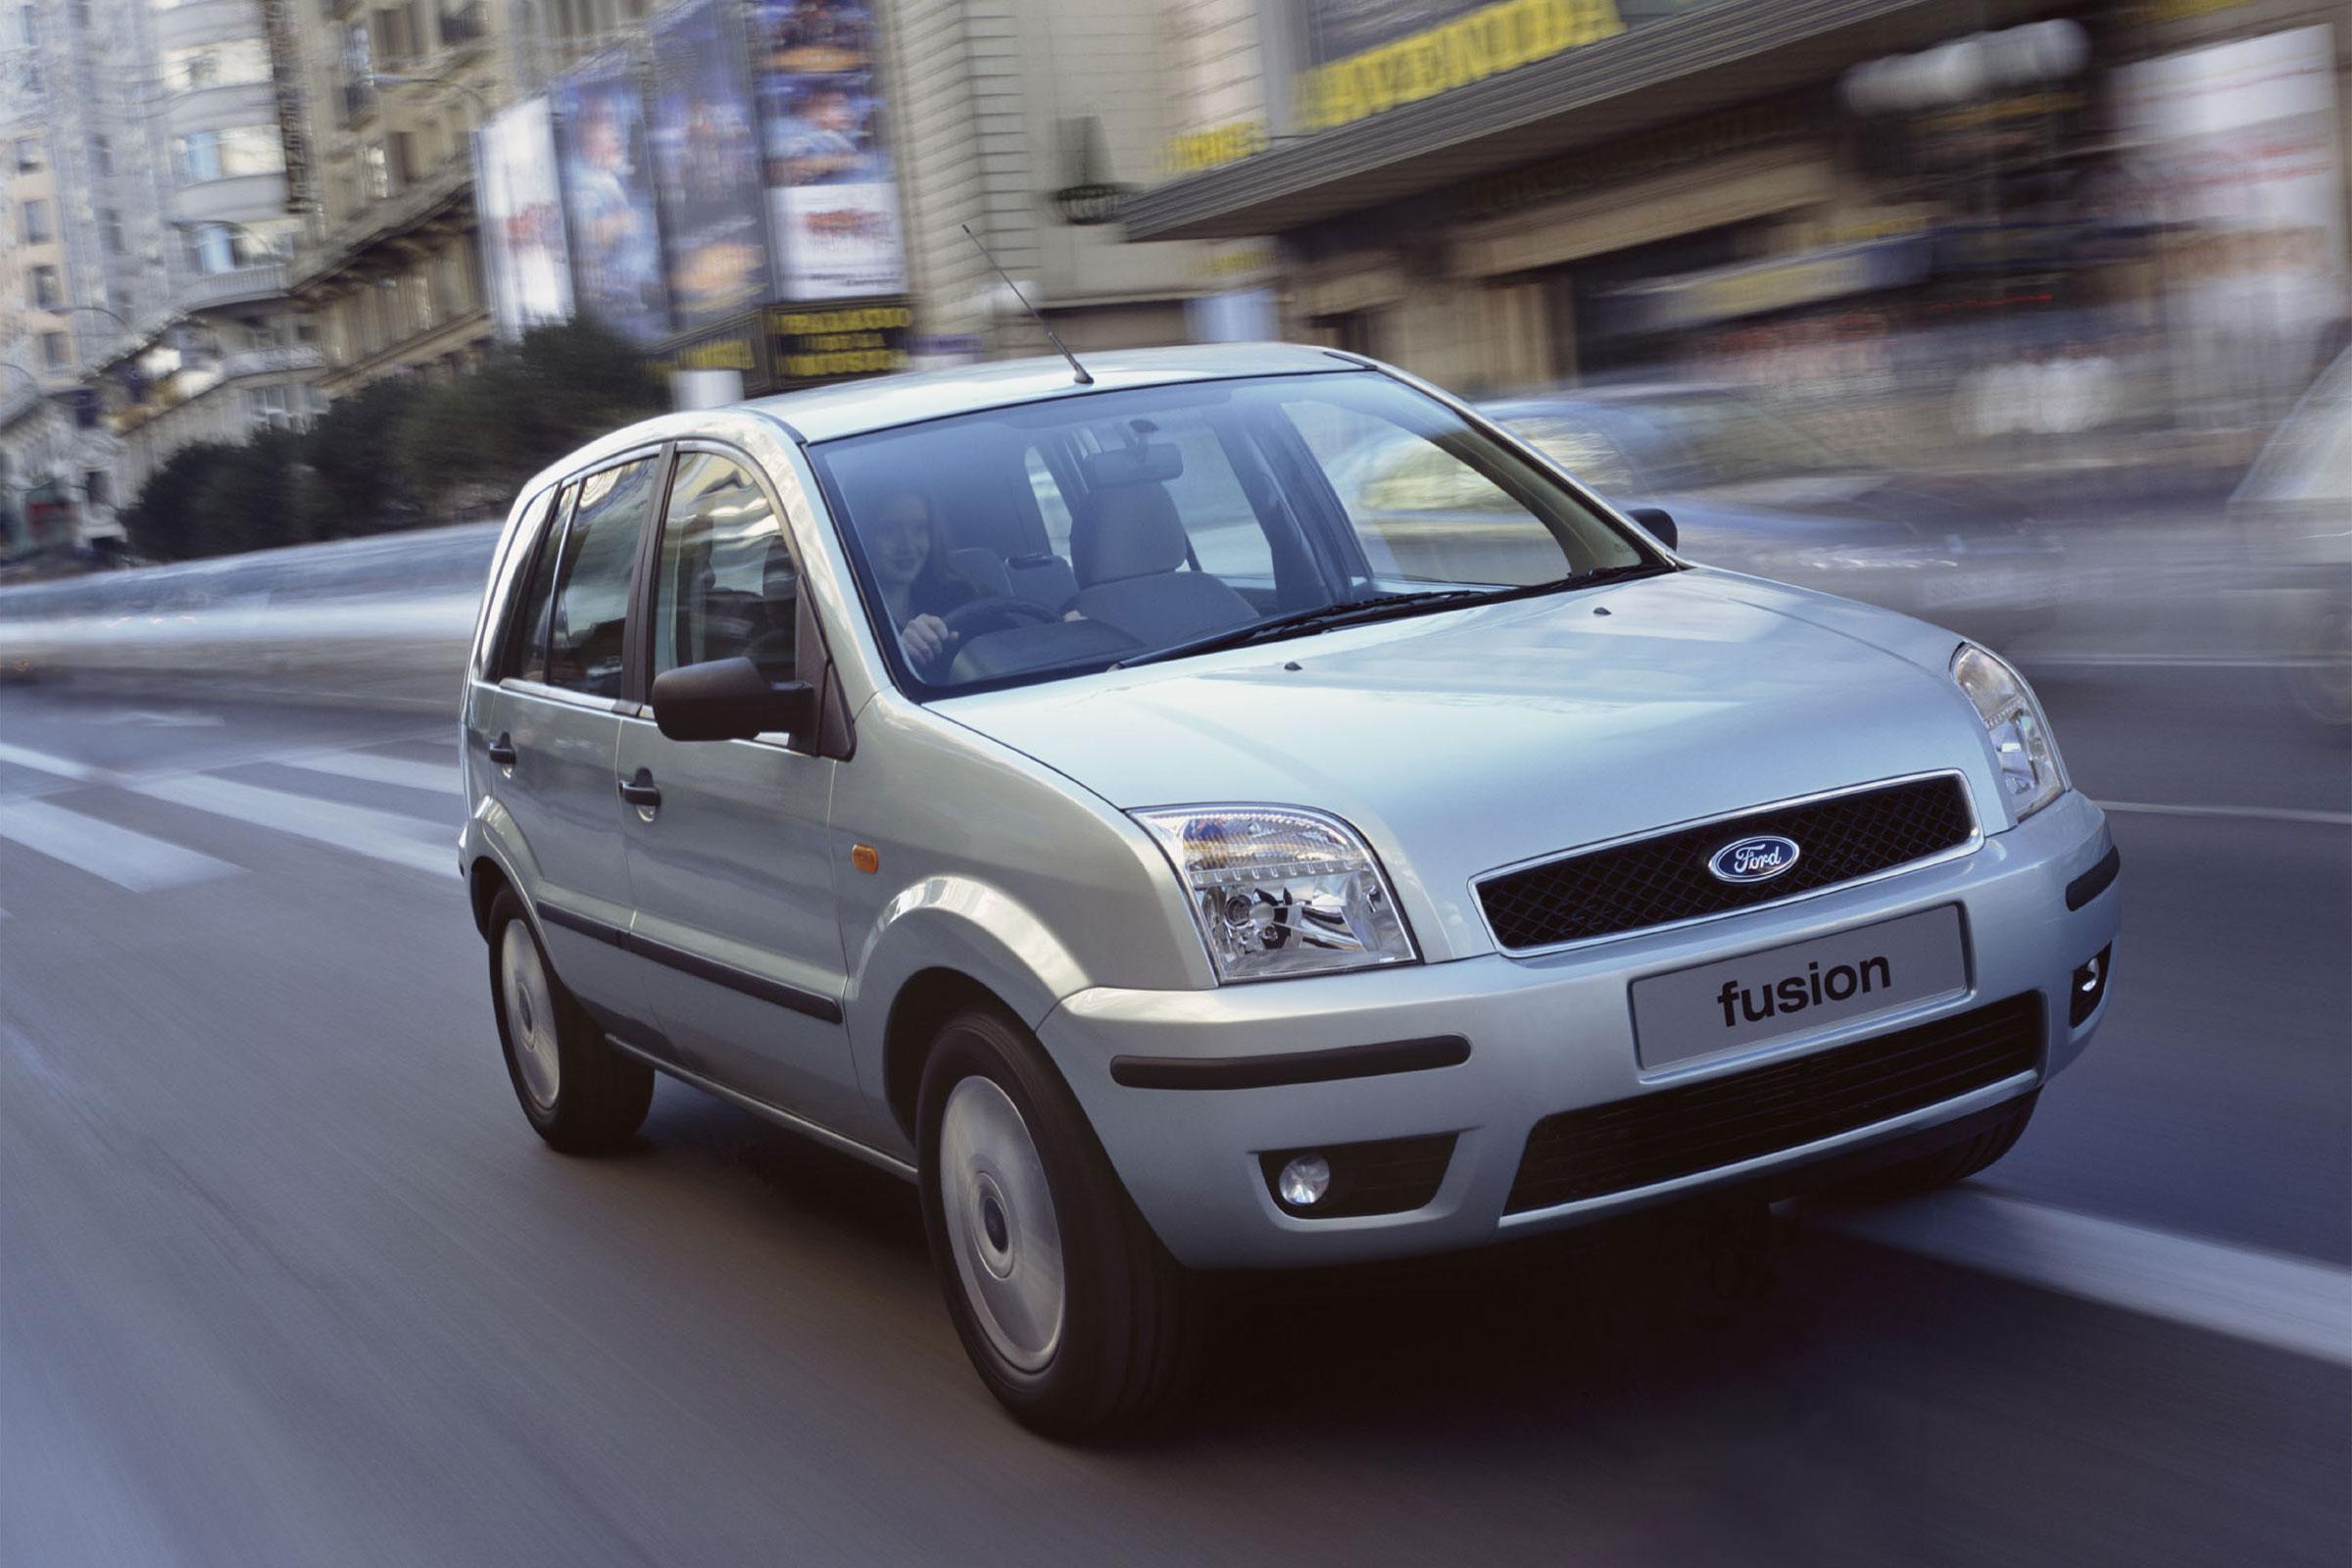 19++ Ford fusion 2007 uk ideas